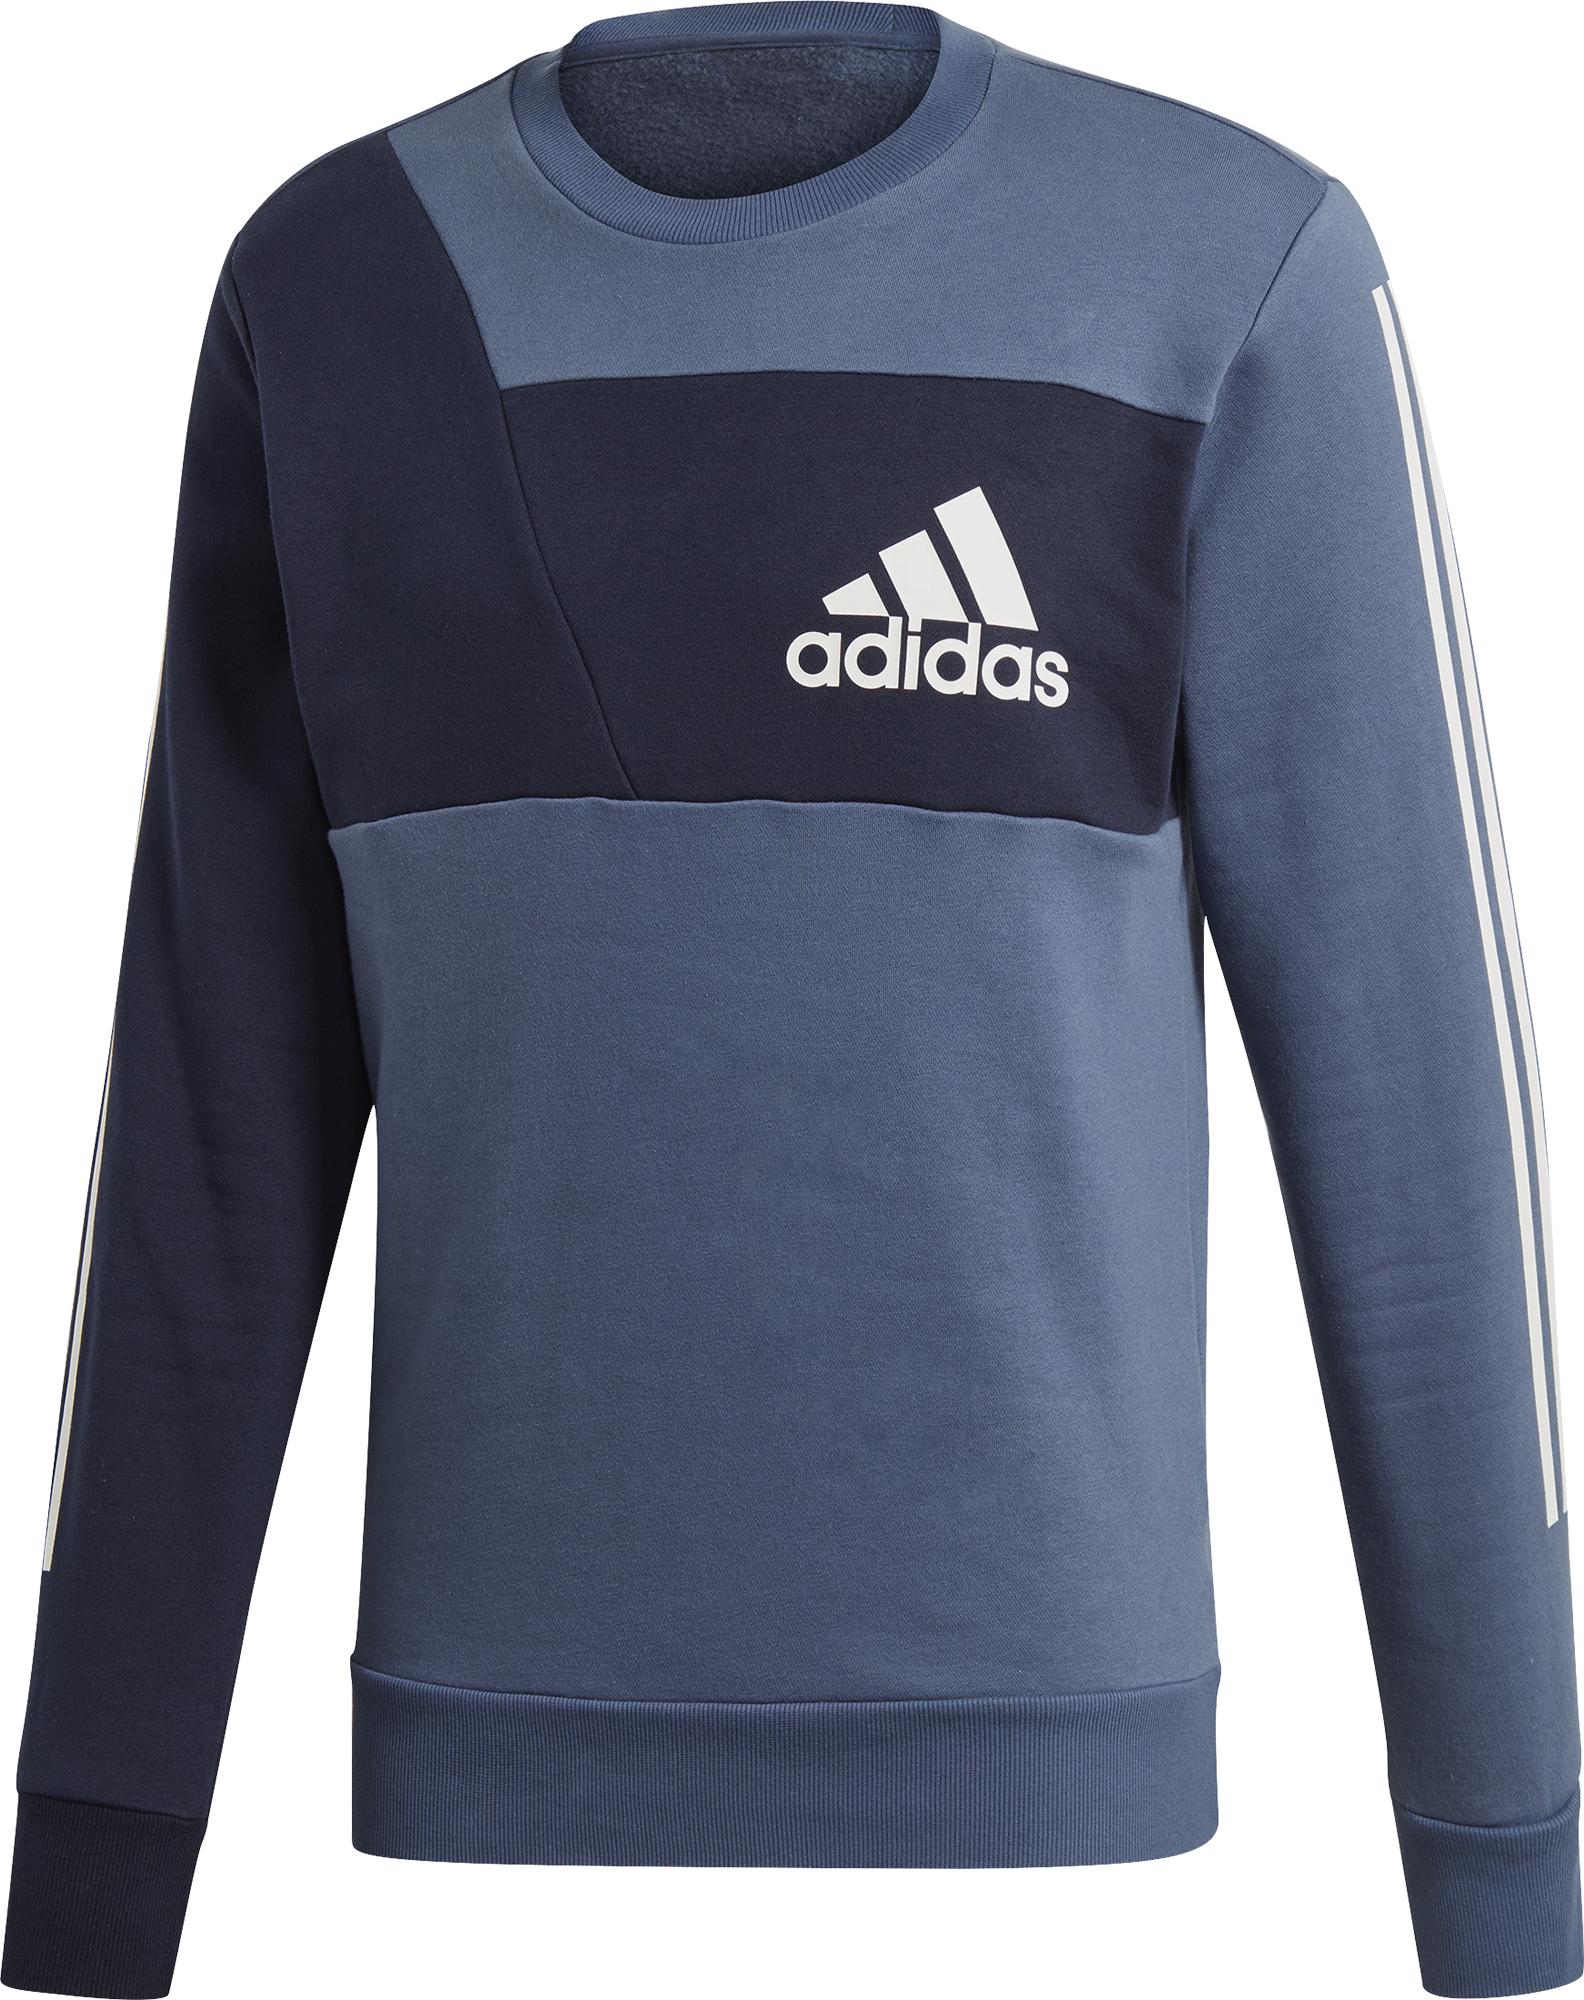 Adidas Свитшот мужской Sport ID Crew, размер 54